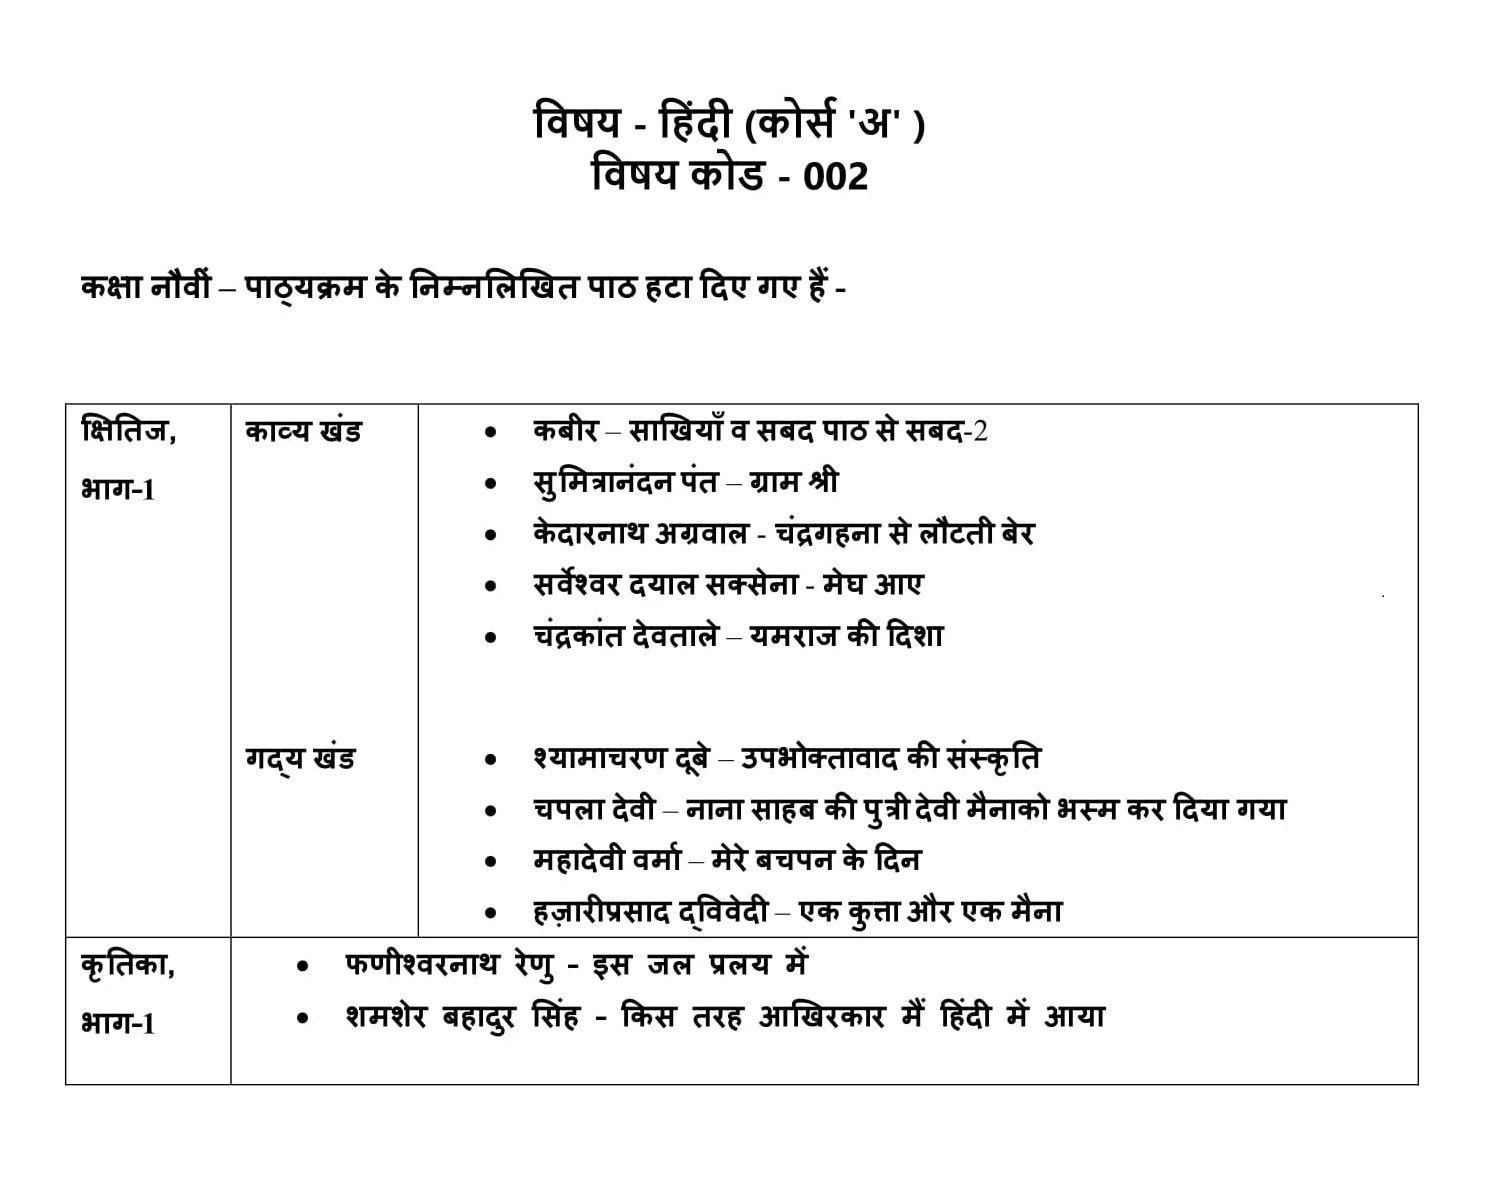 Class Ix Hindi A Deleted Syllabus For The Academic Year 2020 21 Syllabus Class Curriculum [ 1180 x 1512 Pixel ]